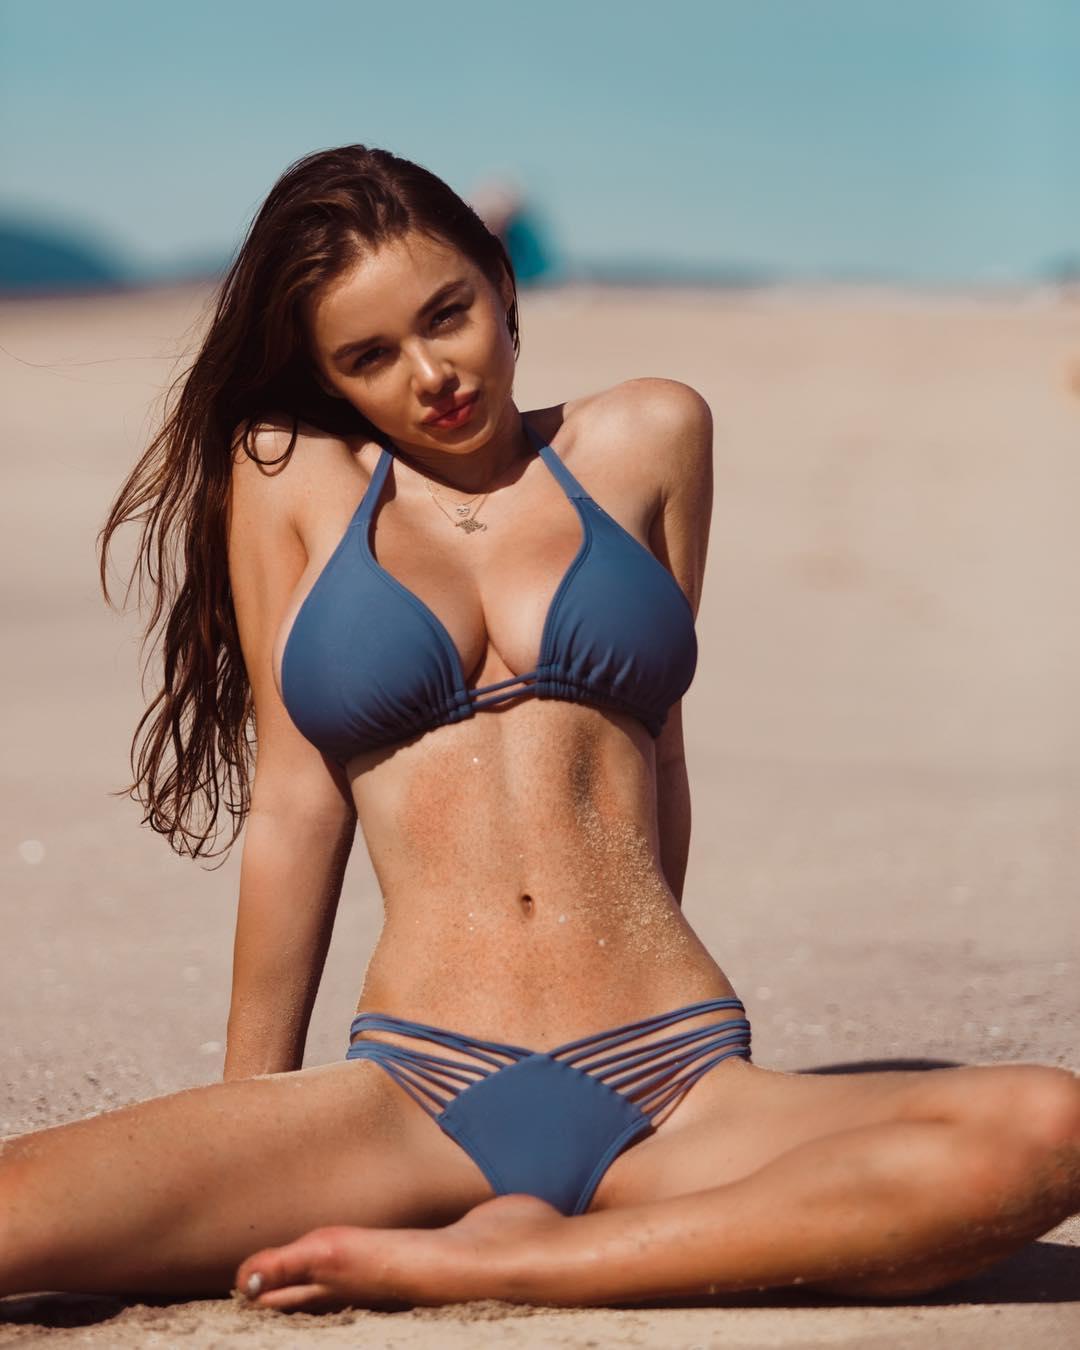 Perfect Skinny Teen Body